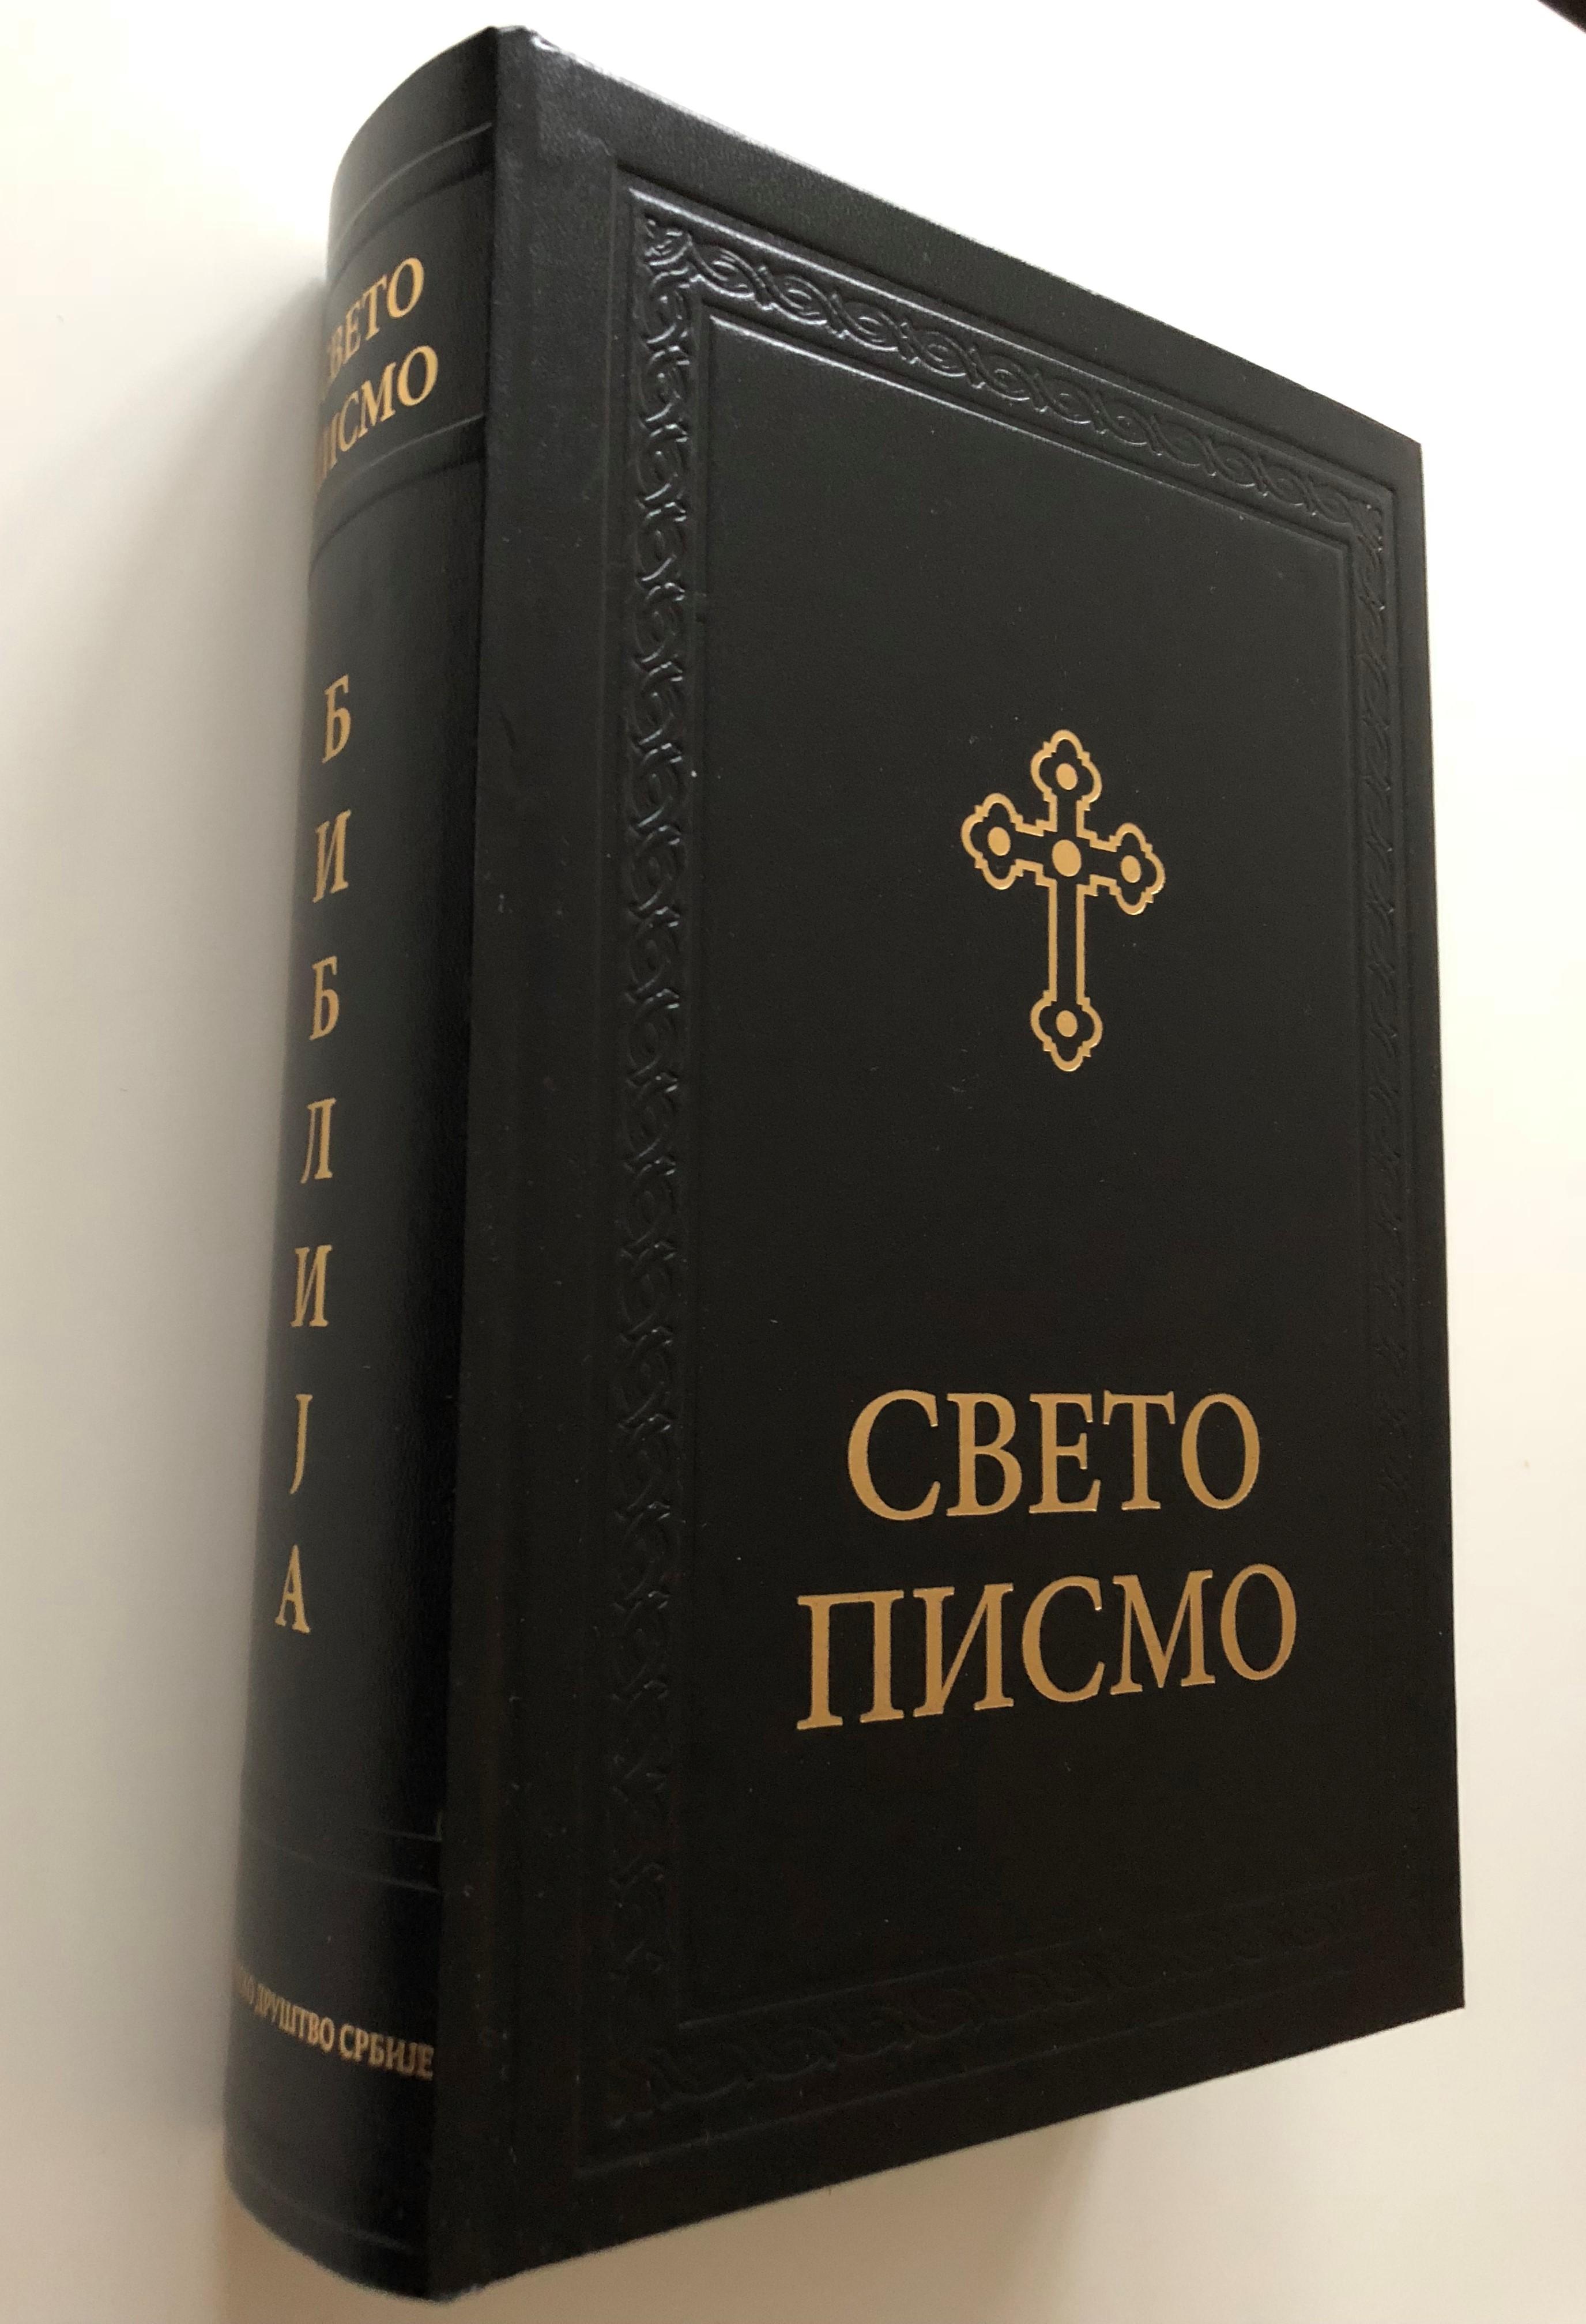 serbian-bible-black-gold-etched-deuterocanonical-2-.jpg